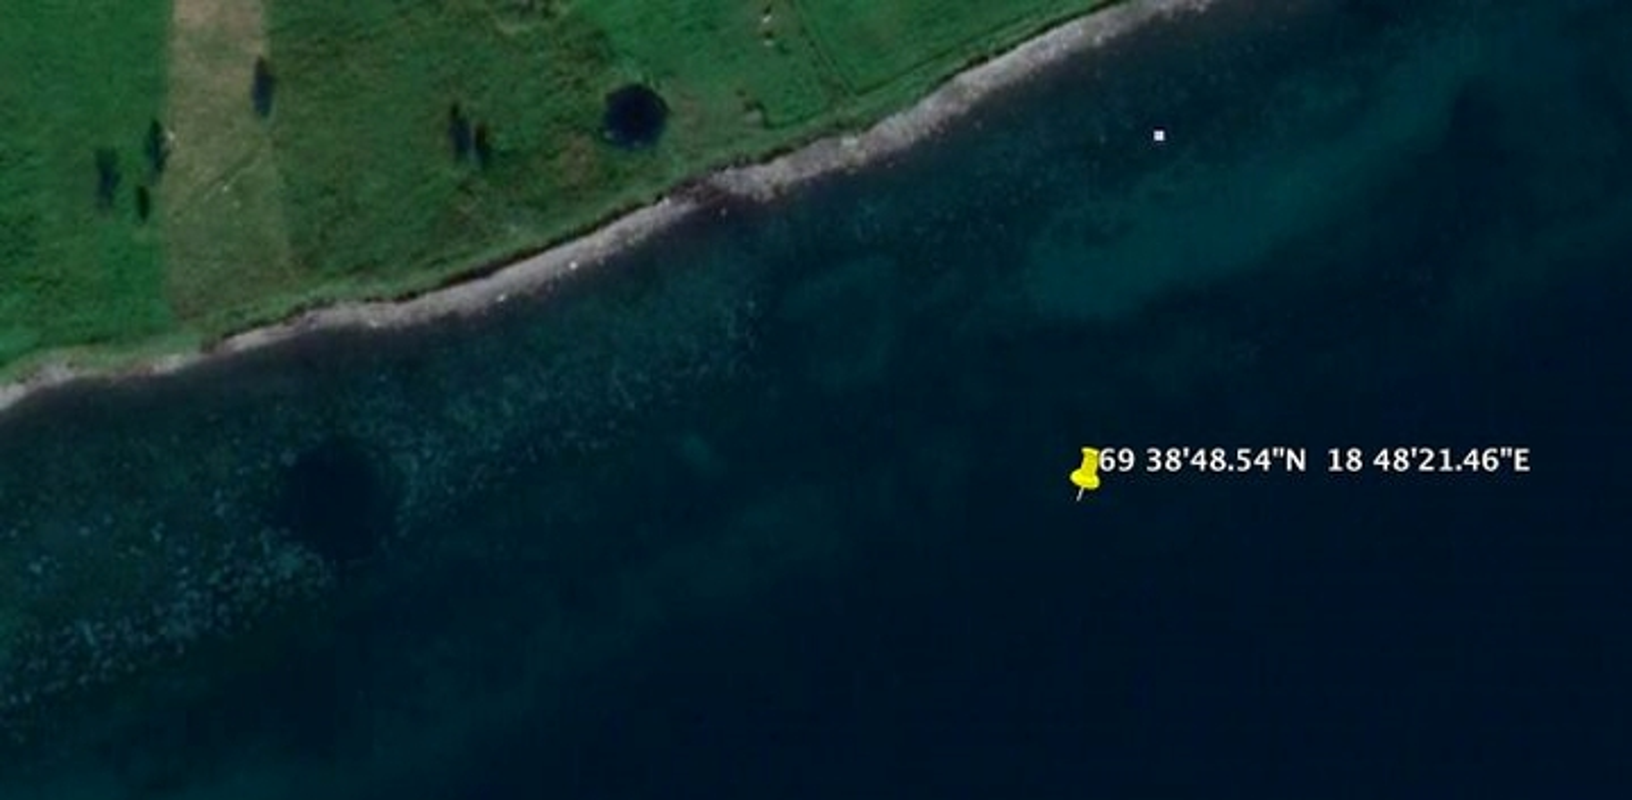 Bat ngo voi nhung buc anh thu vi tim duoc tren Google Earth (2)-Hinh-6